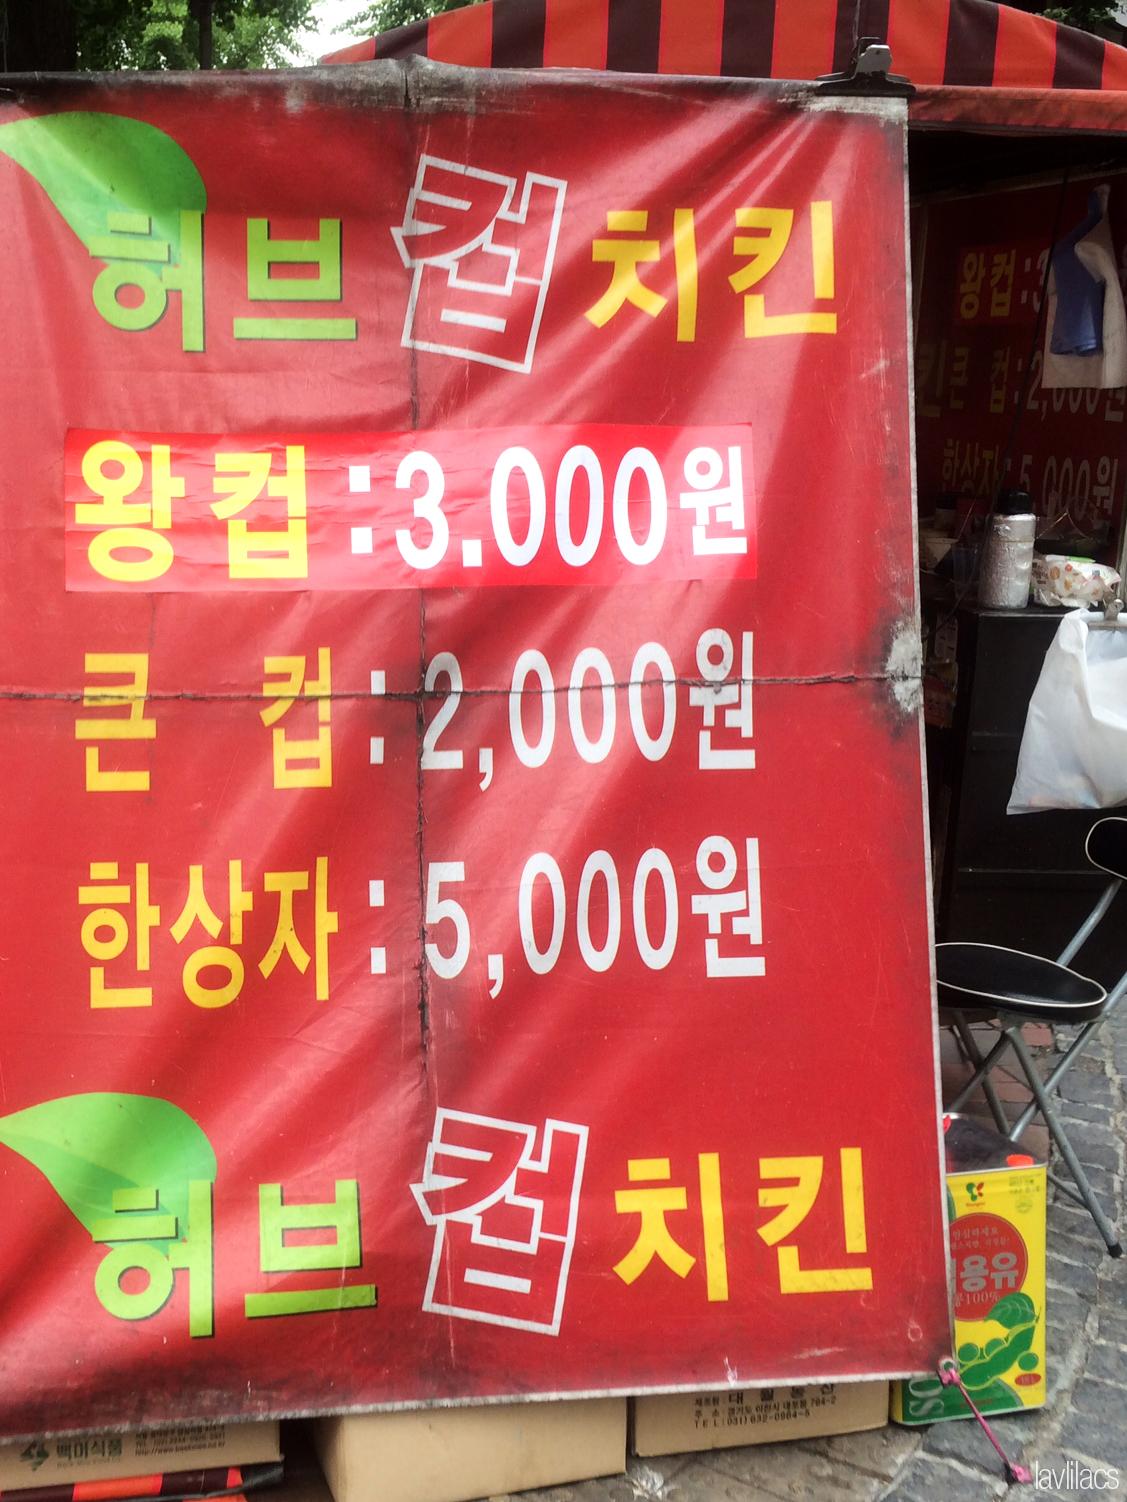 Seoul, Korea - Summer Study Abroad 2014 - Edae Street Eats - Cup Chicken price